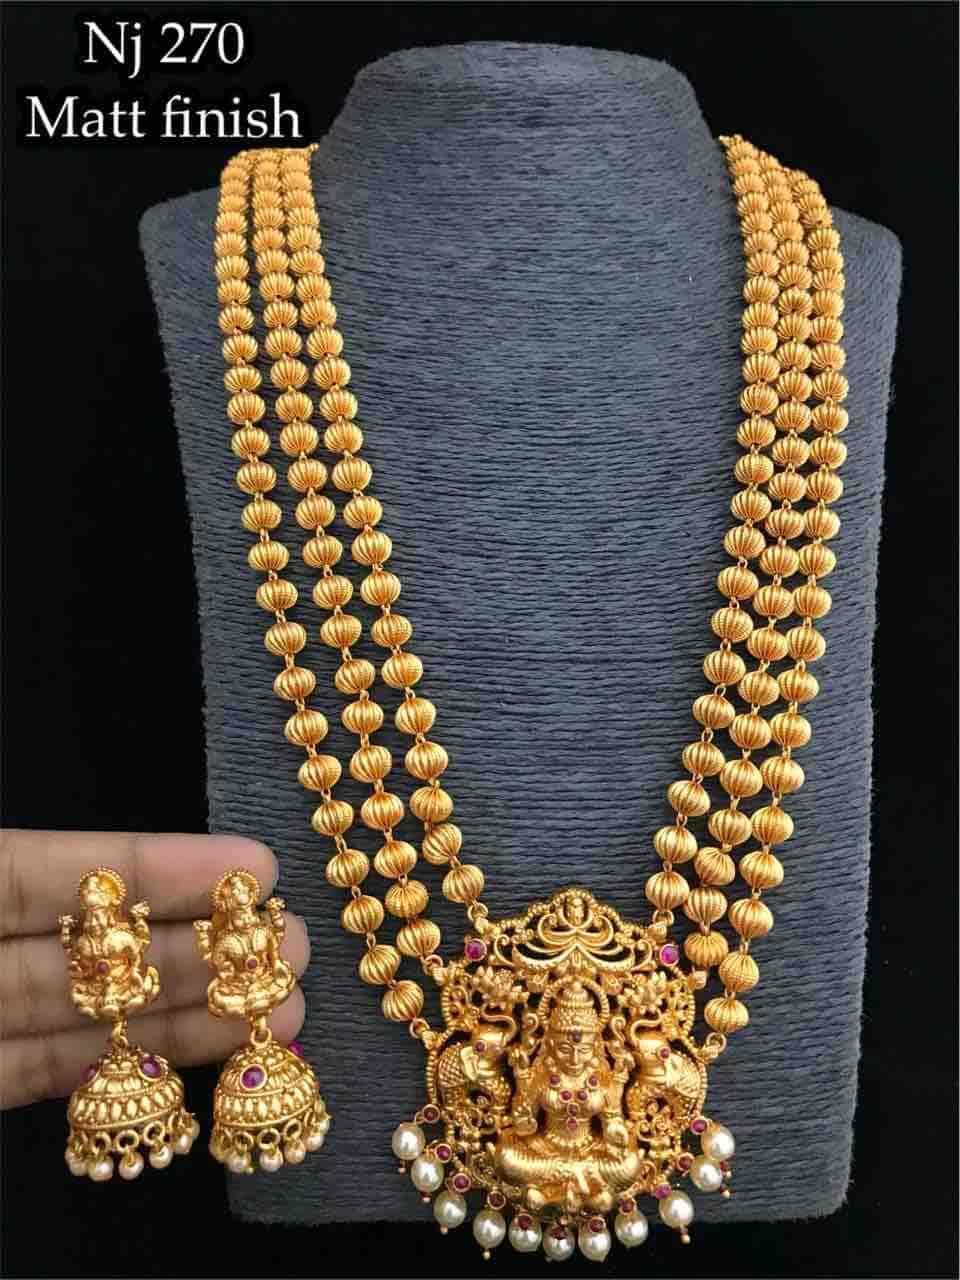 1 Gram Gold Jewellery In Usa June 2020